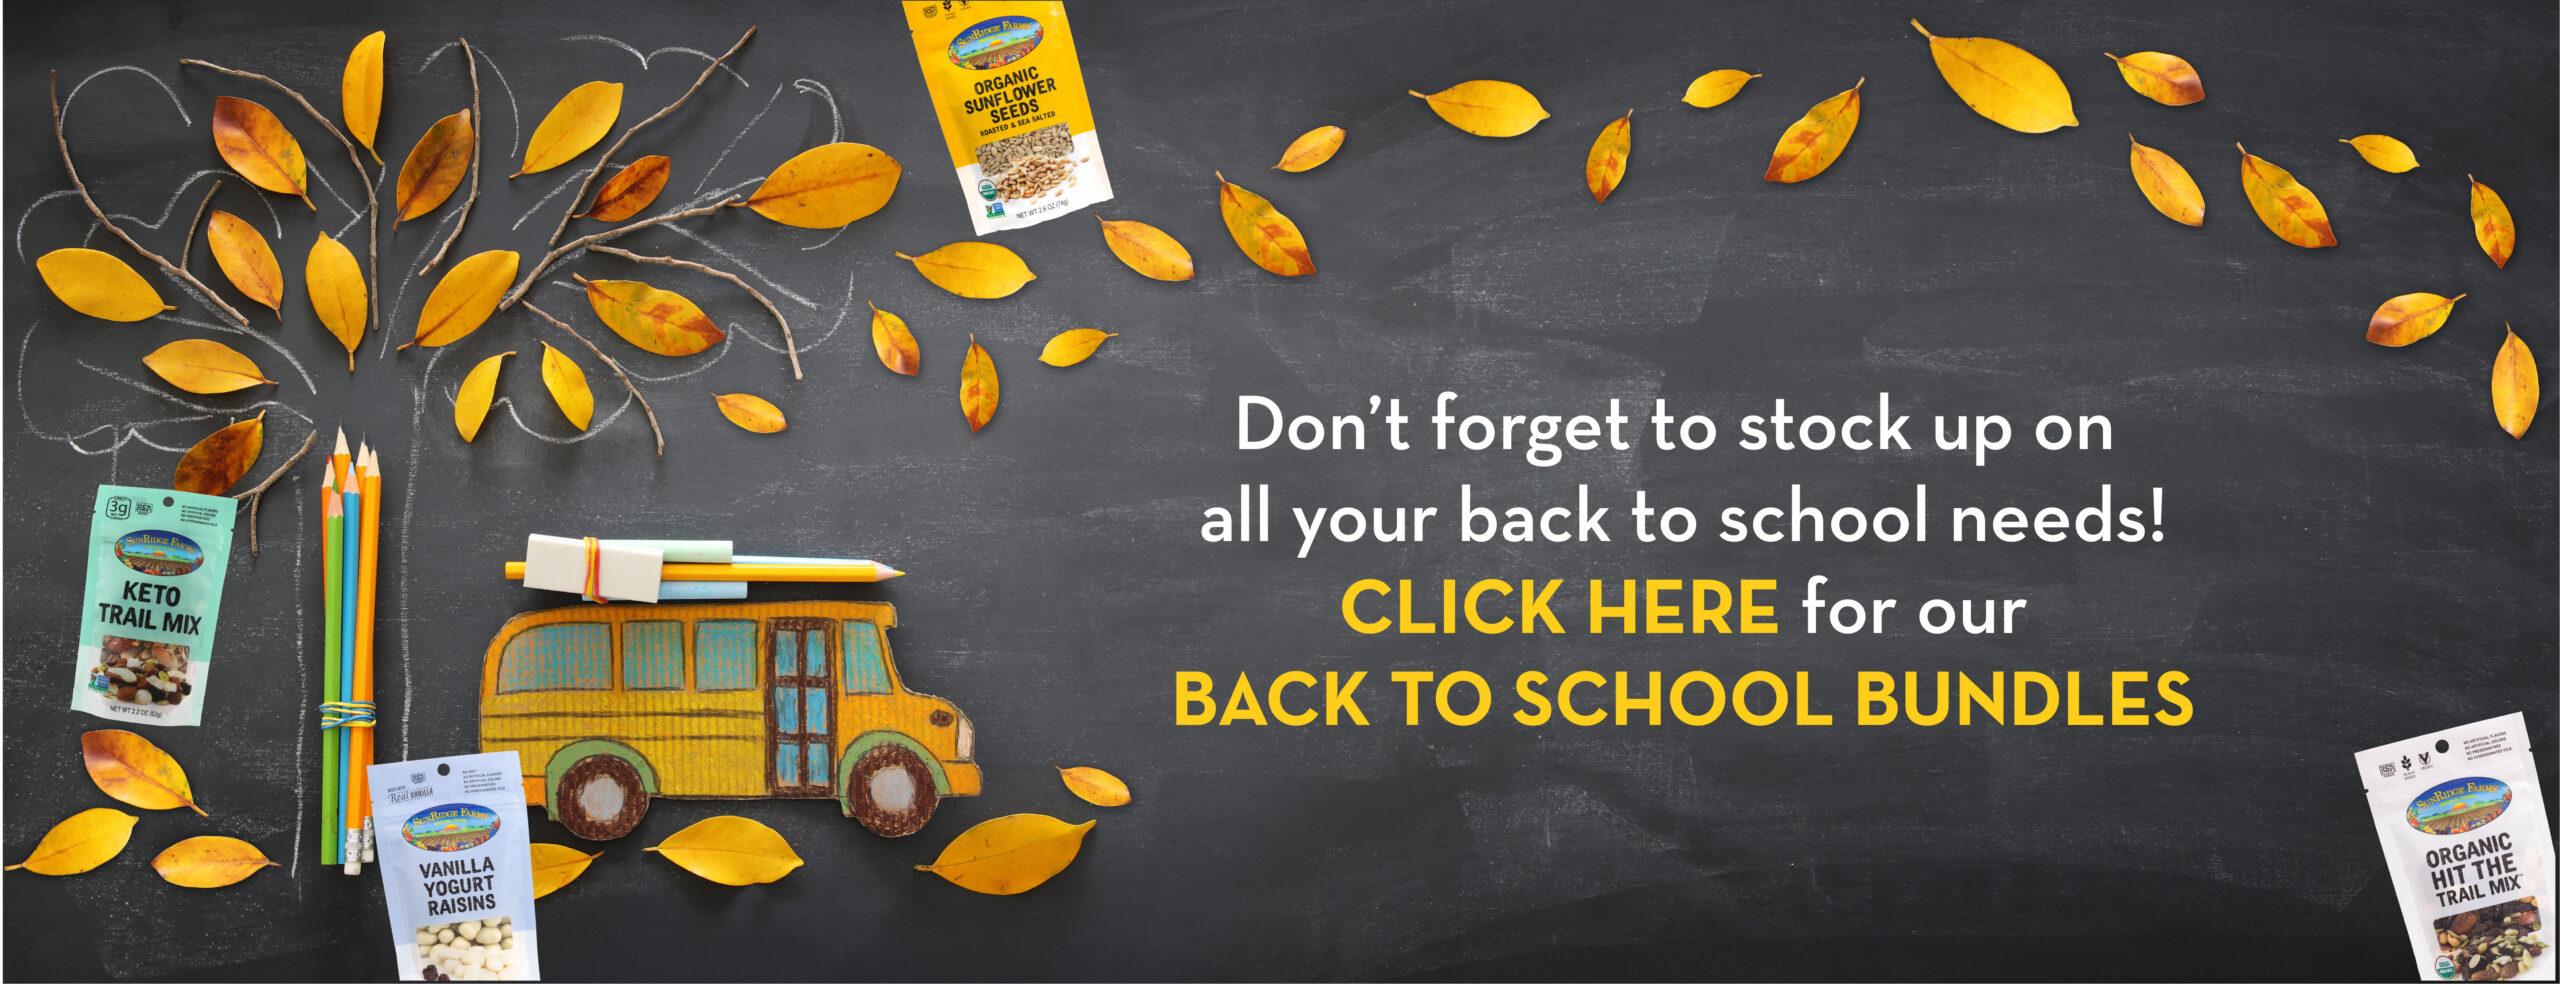 BackToSchoolBundles_2021_Homepage_banner_2021